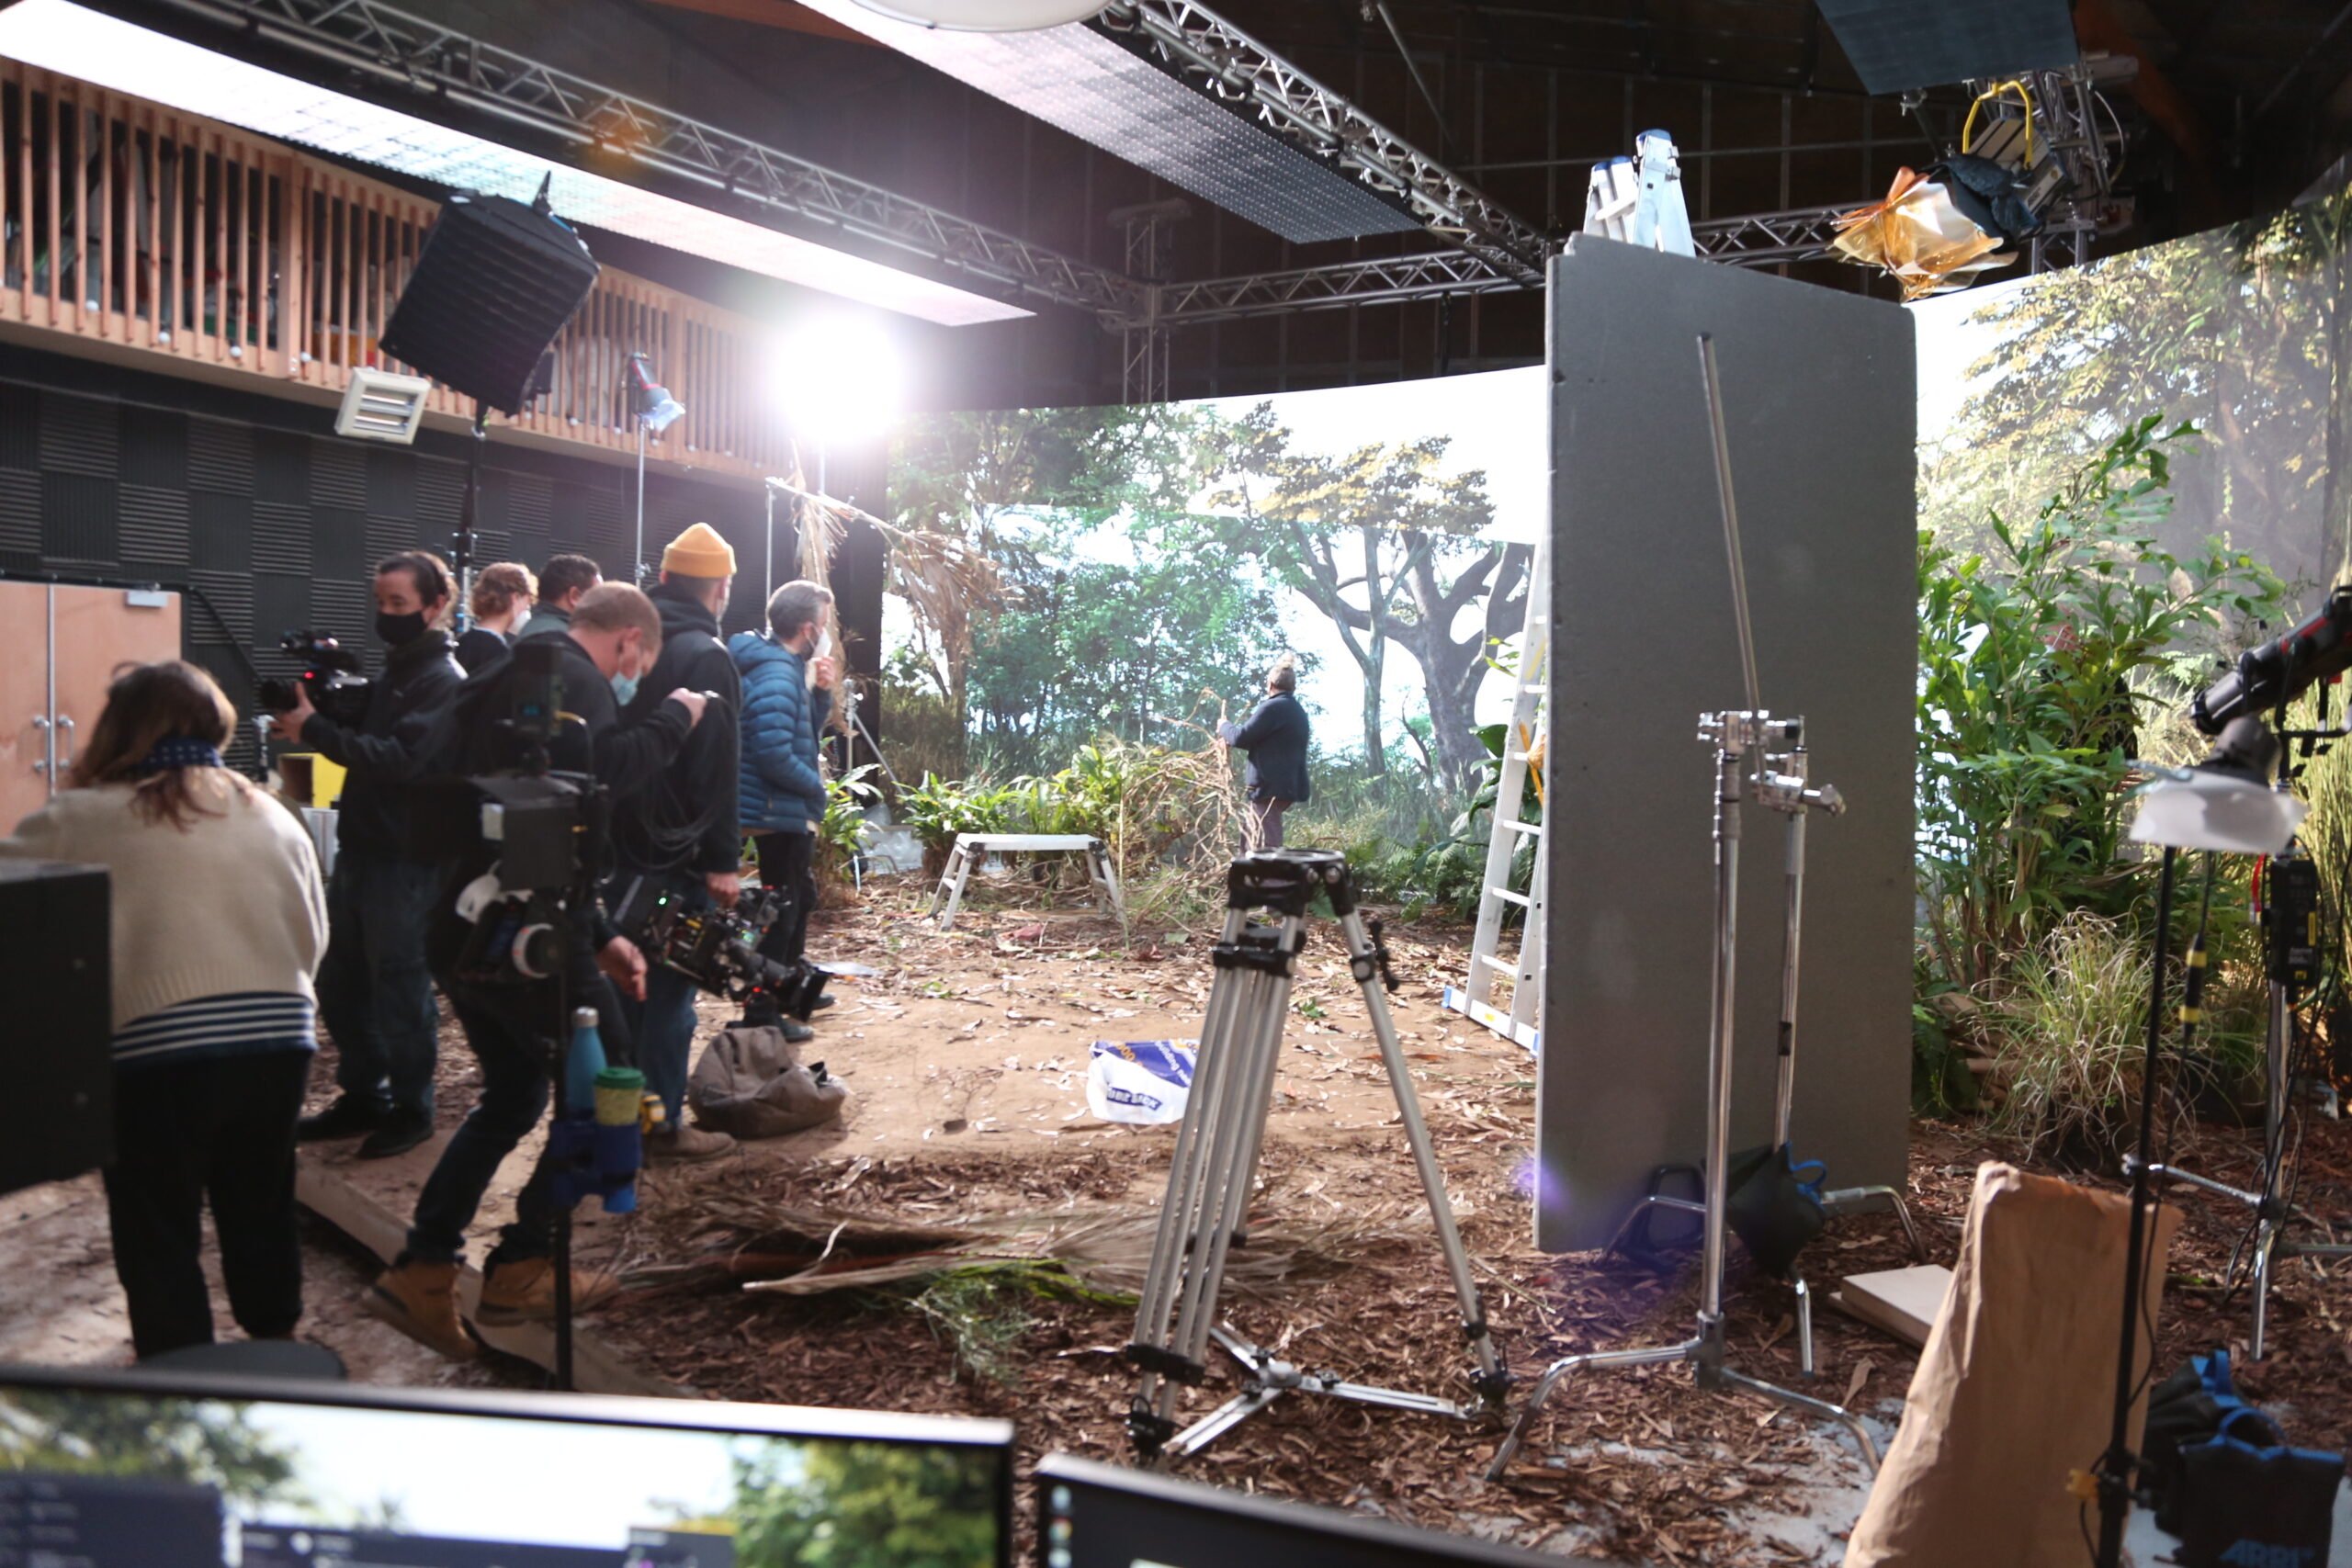 Vero behind the scenes image